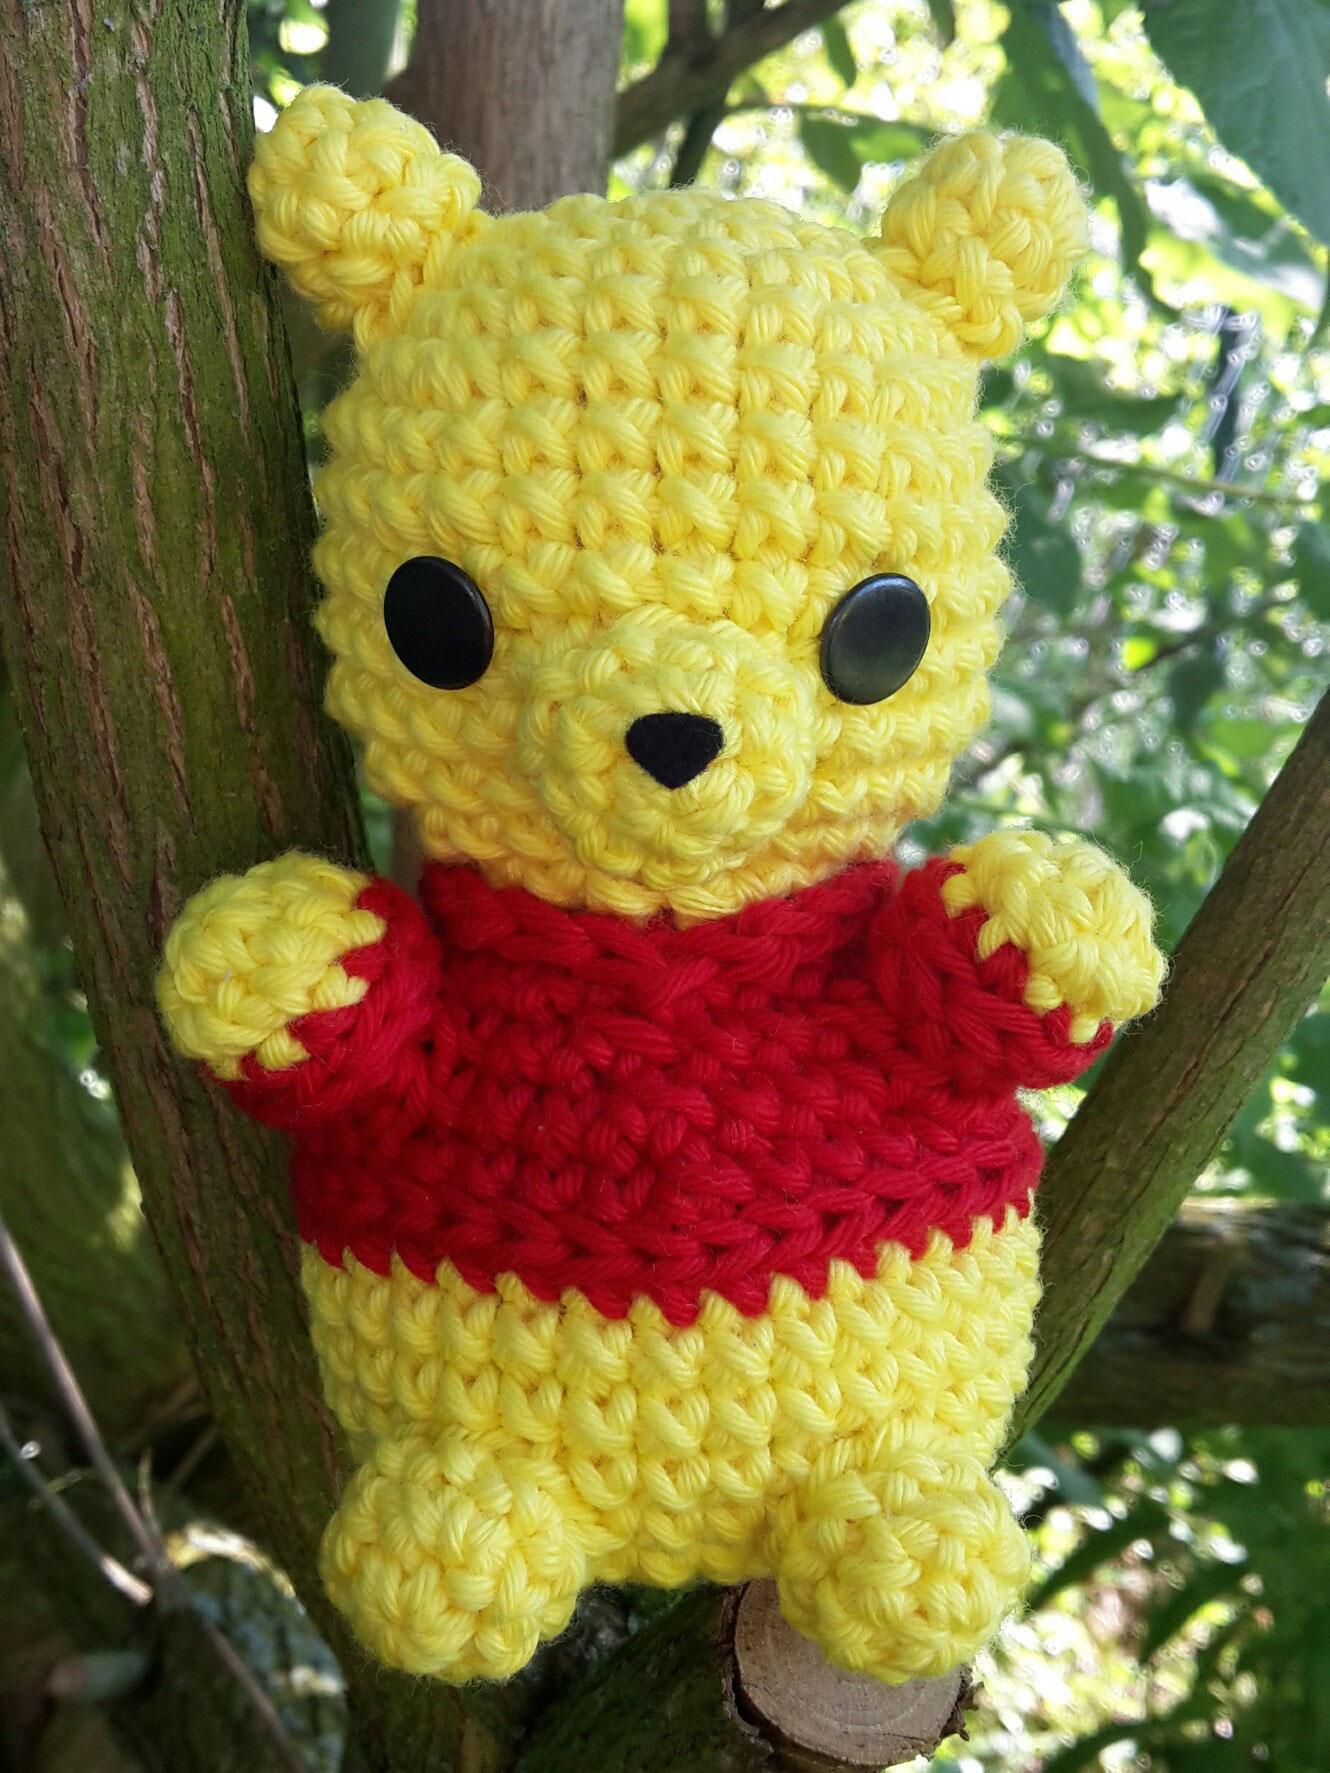 Amigurumi – Crochet Baby Winnie the Pooh - premium & free patterns ... | 1773x1330